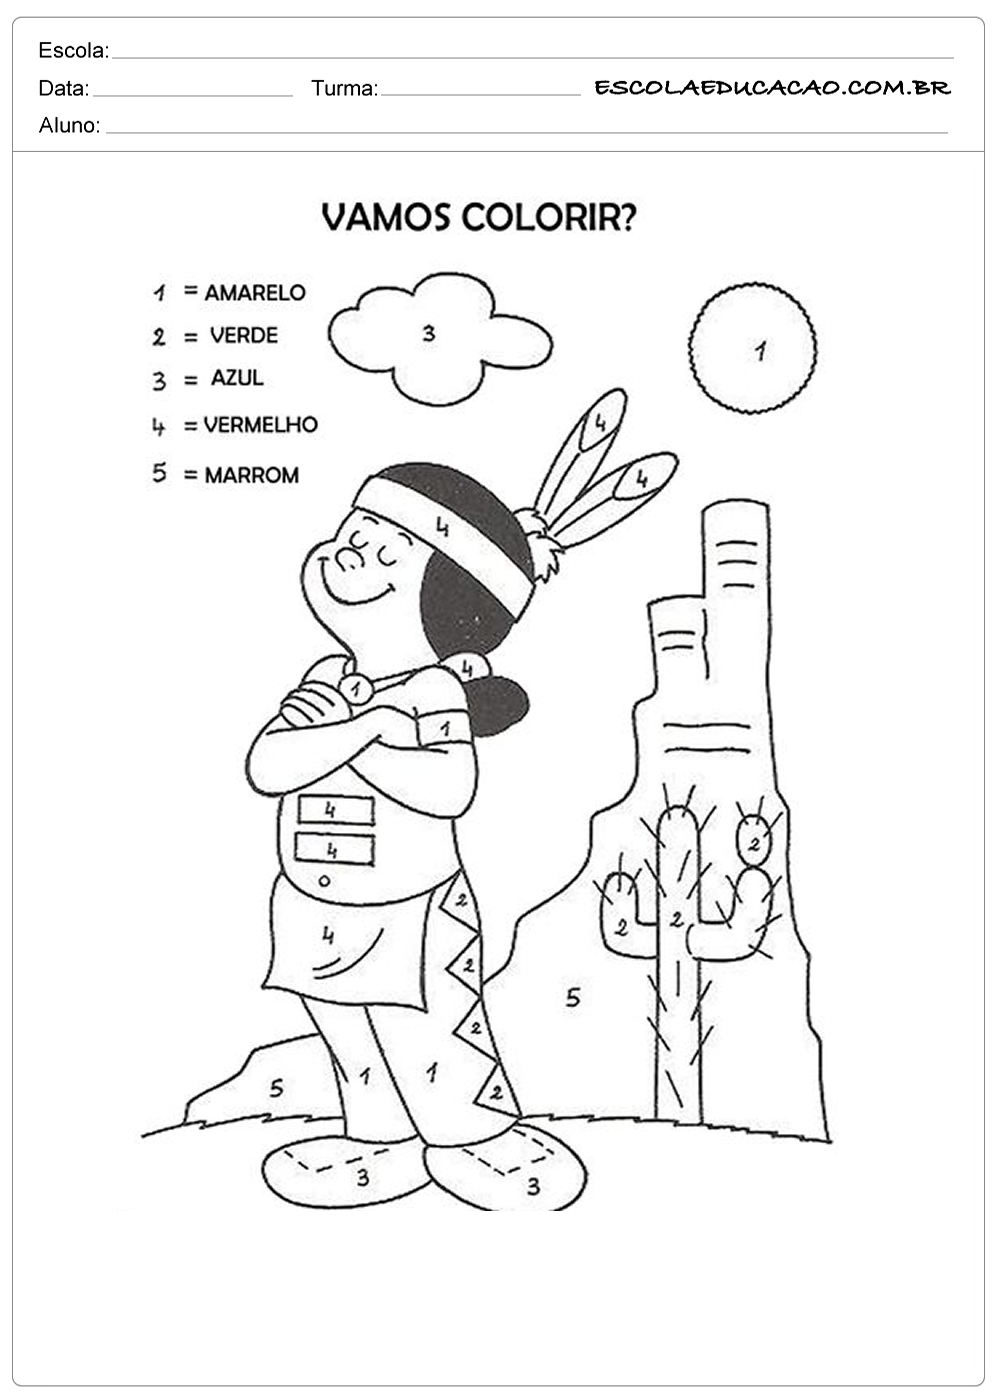 Atividade Dia Do Indio Vamos Colorir Escola Educacao